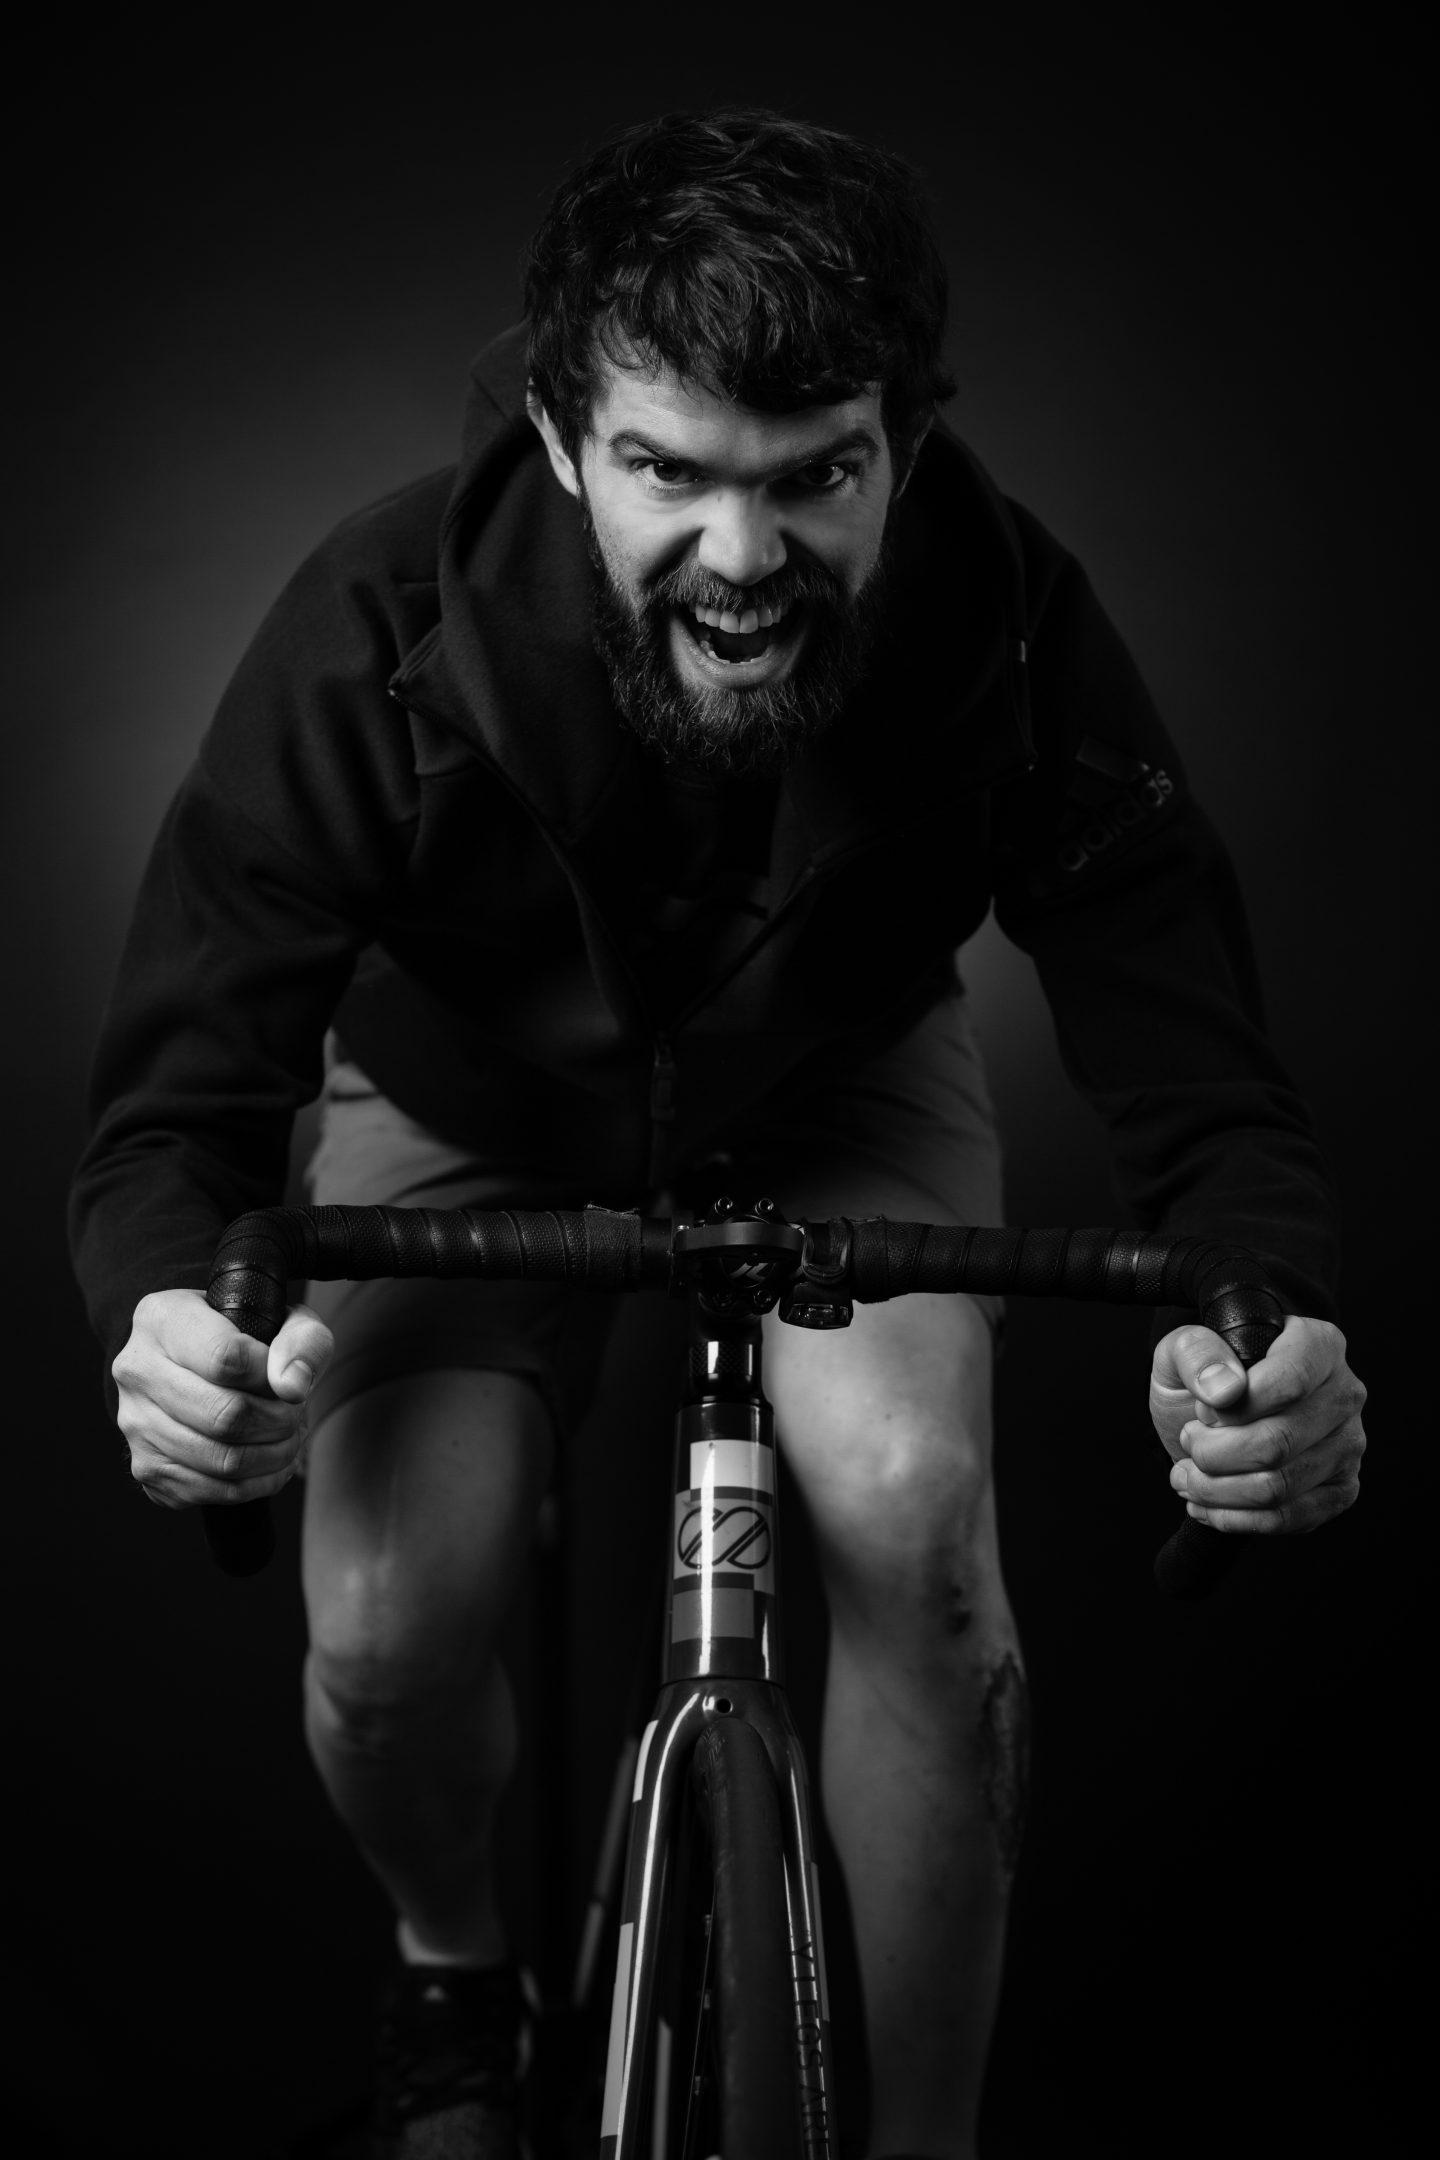 screaming man on bike, interview stefan schott 8bar bikes